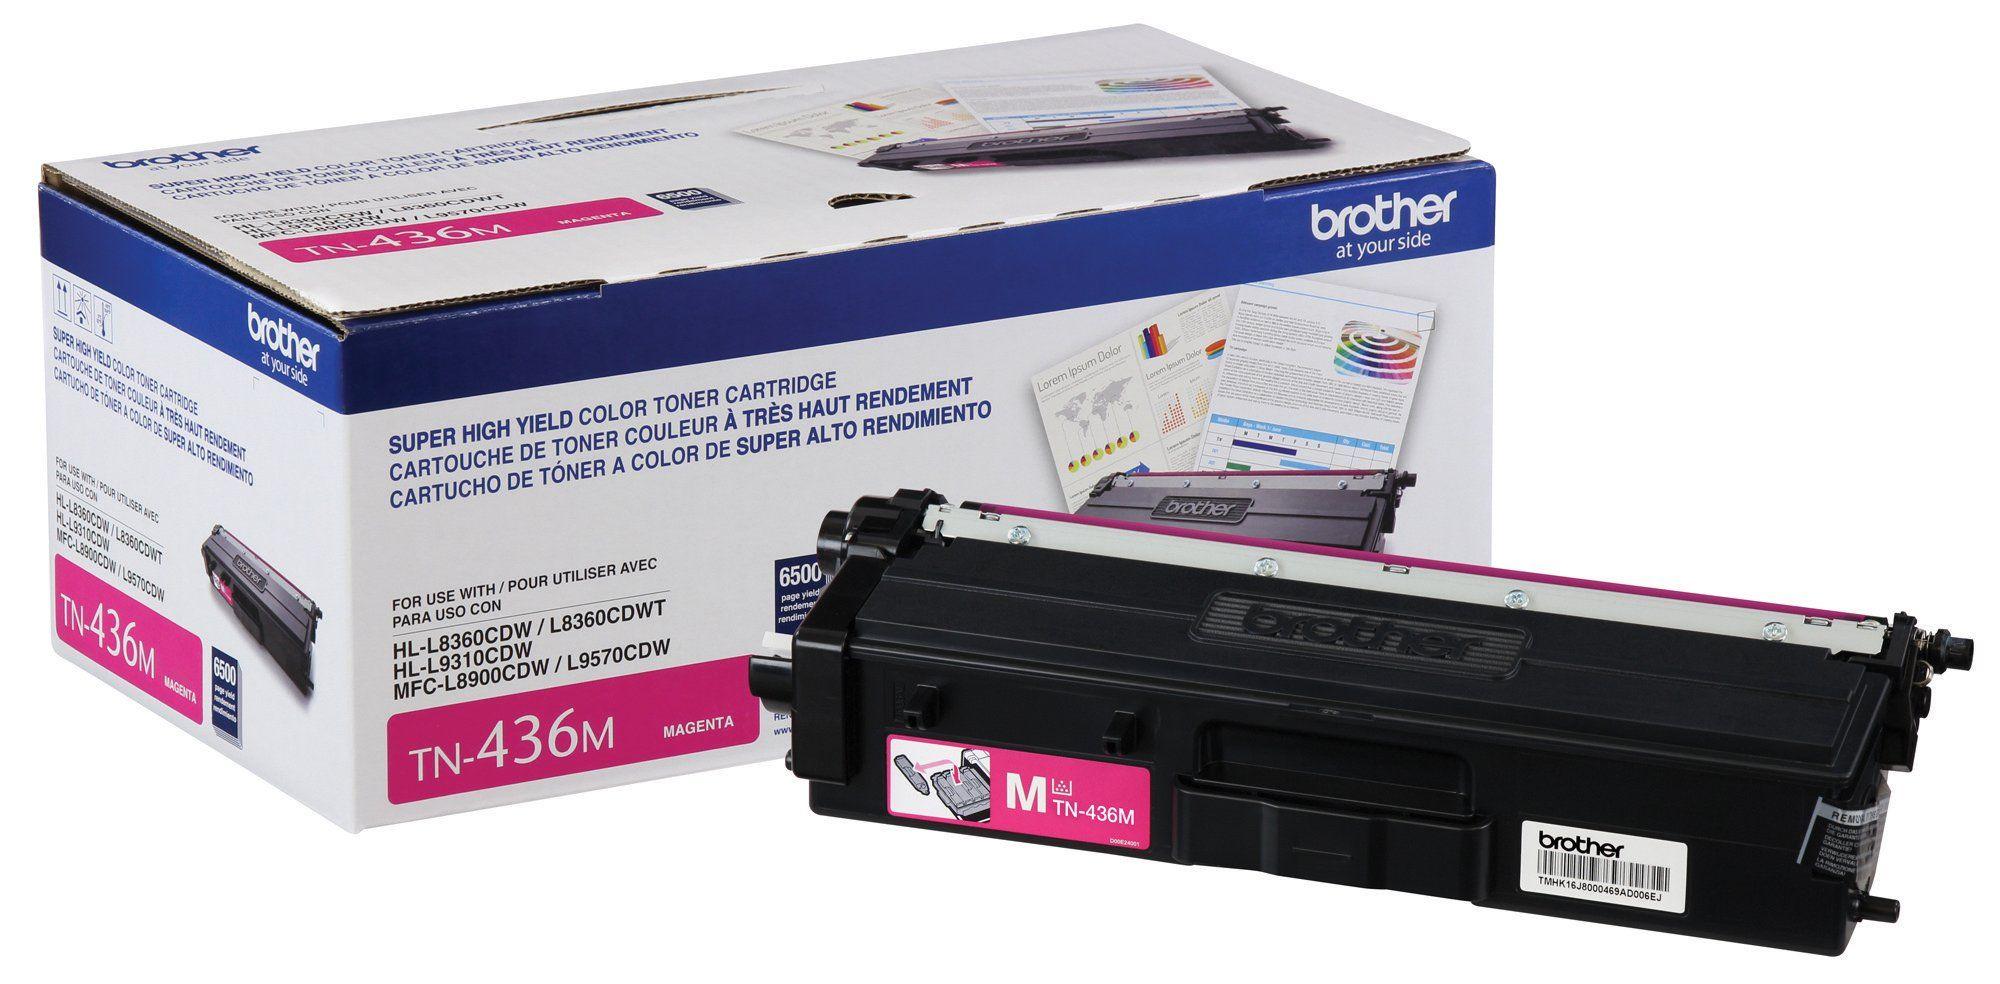 Brother Genuine Super High Yield Toner Cartridge TN436M